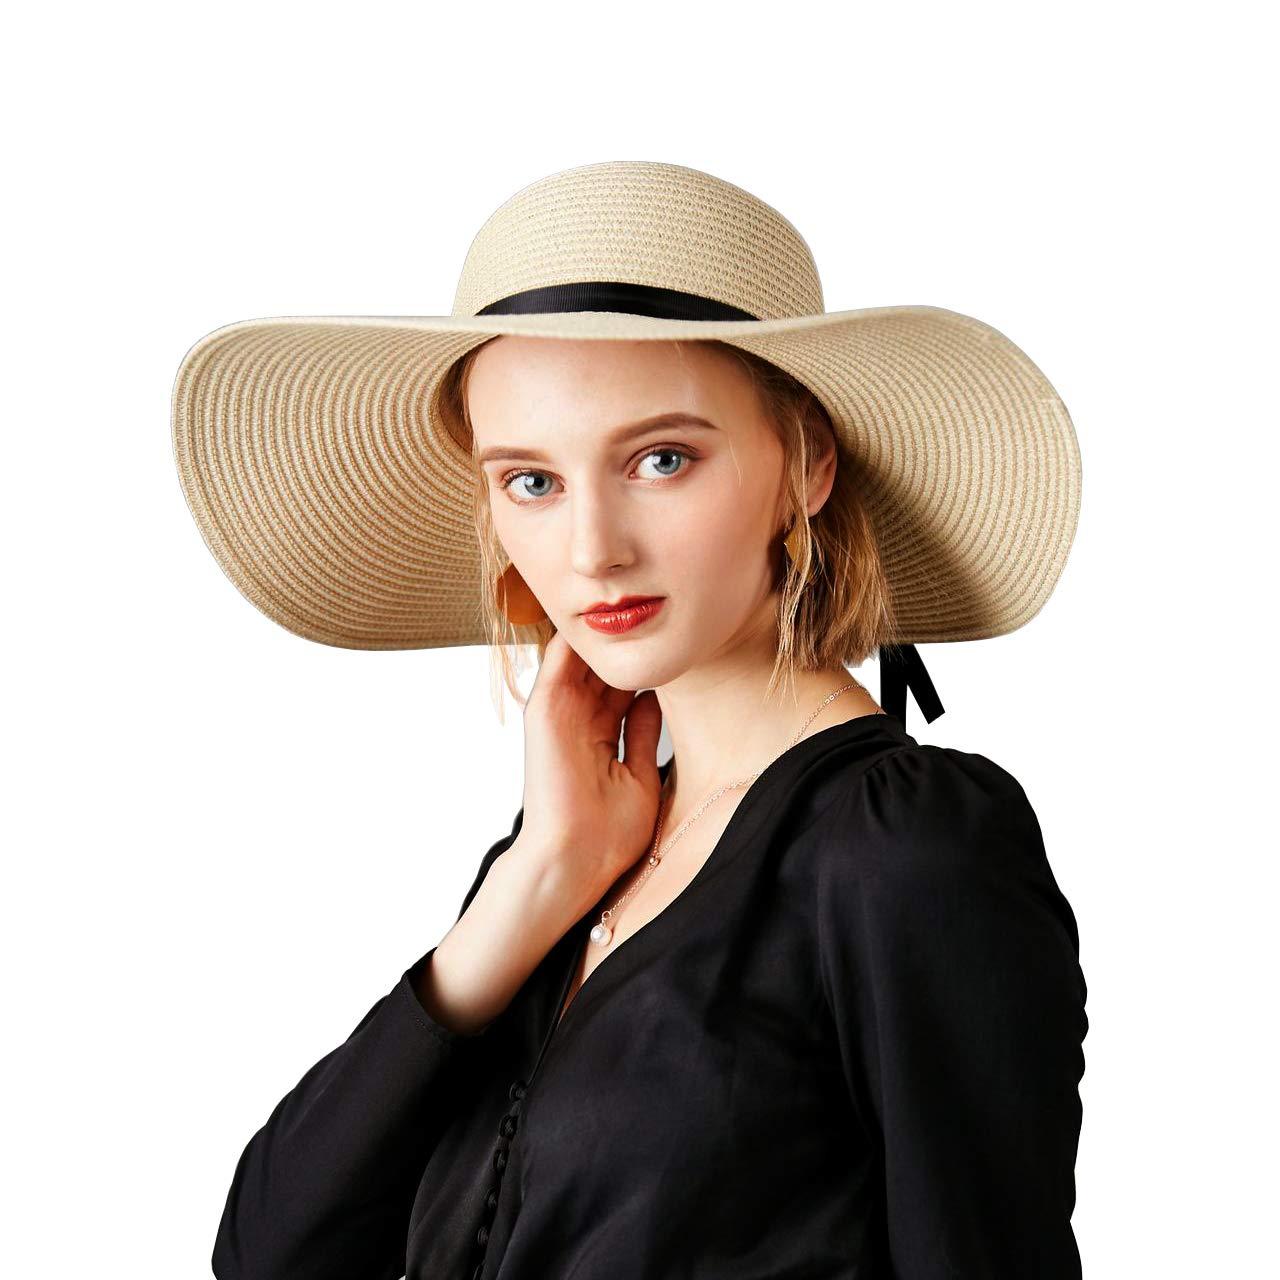 Abeige Women's Big Brim Sun Hat Floppy Foldable Bowknot Straw Hat Summer Beach Hat UPF 50+